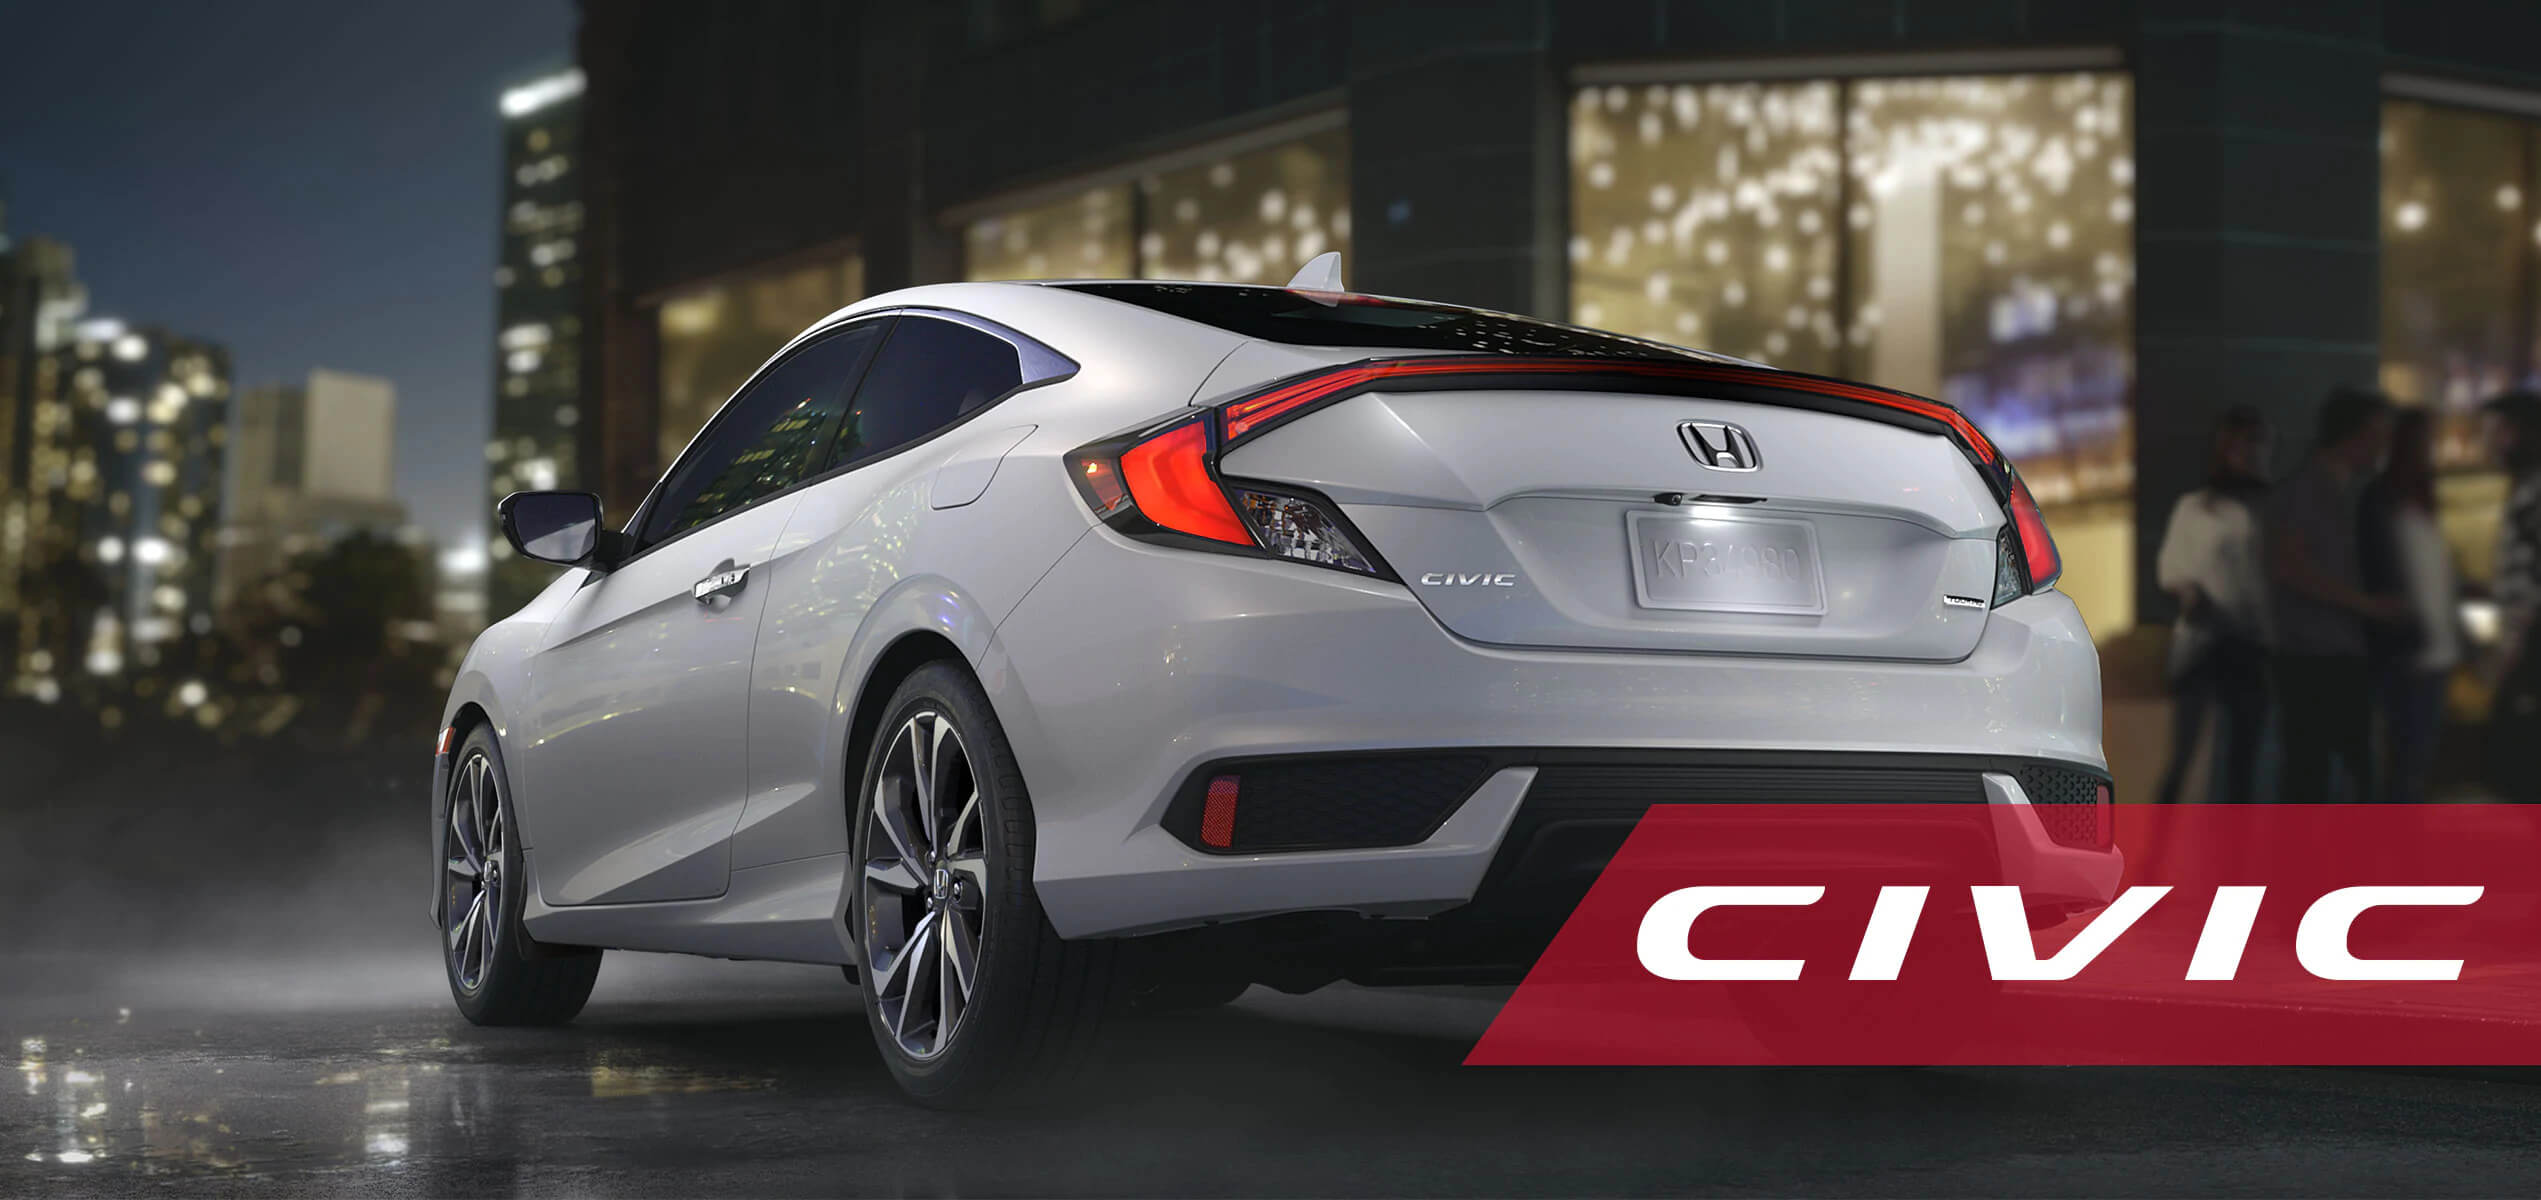 2020 Honda Civic Coupe I Sporty Two Door Honda Vehicle I Available